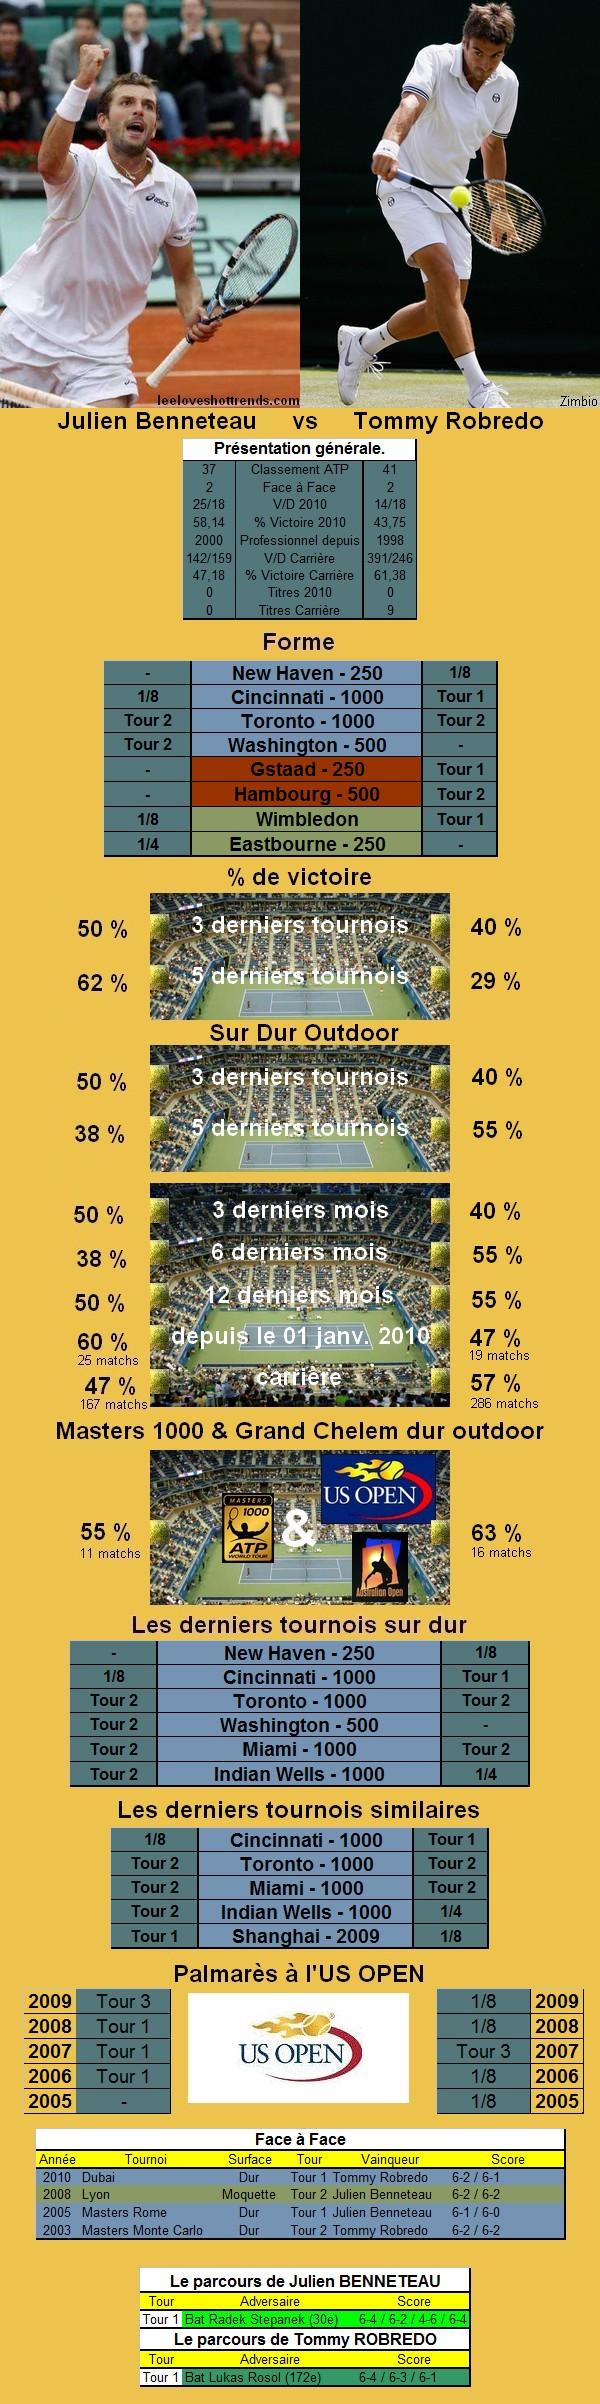 Statistiques tennis de Benneteau contre Robredo à l'US OPEN